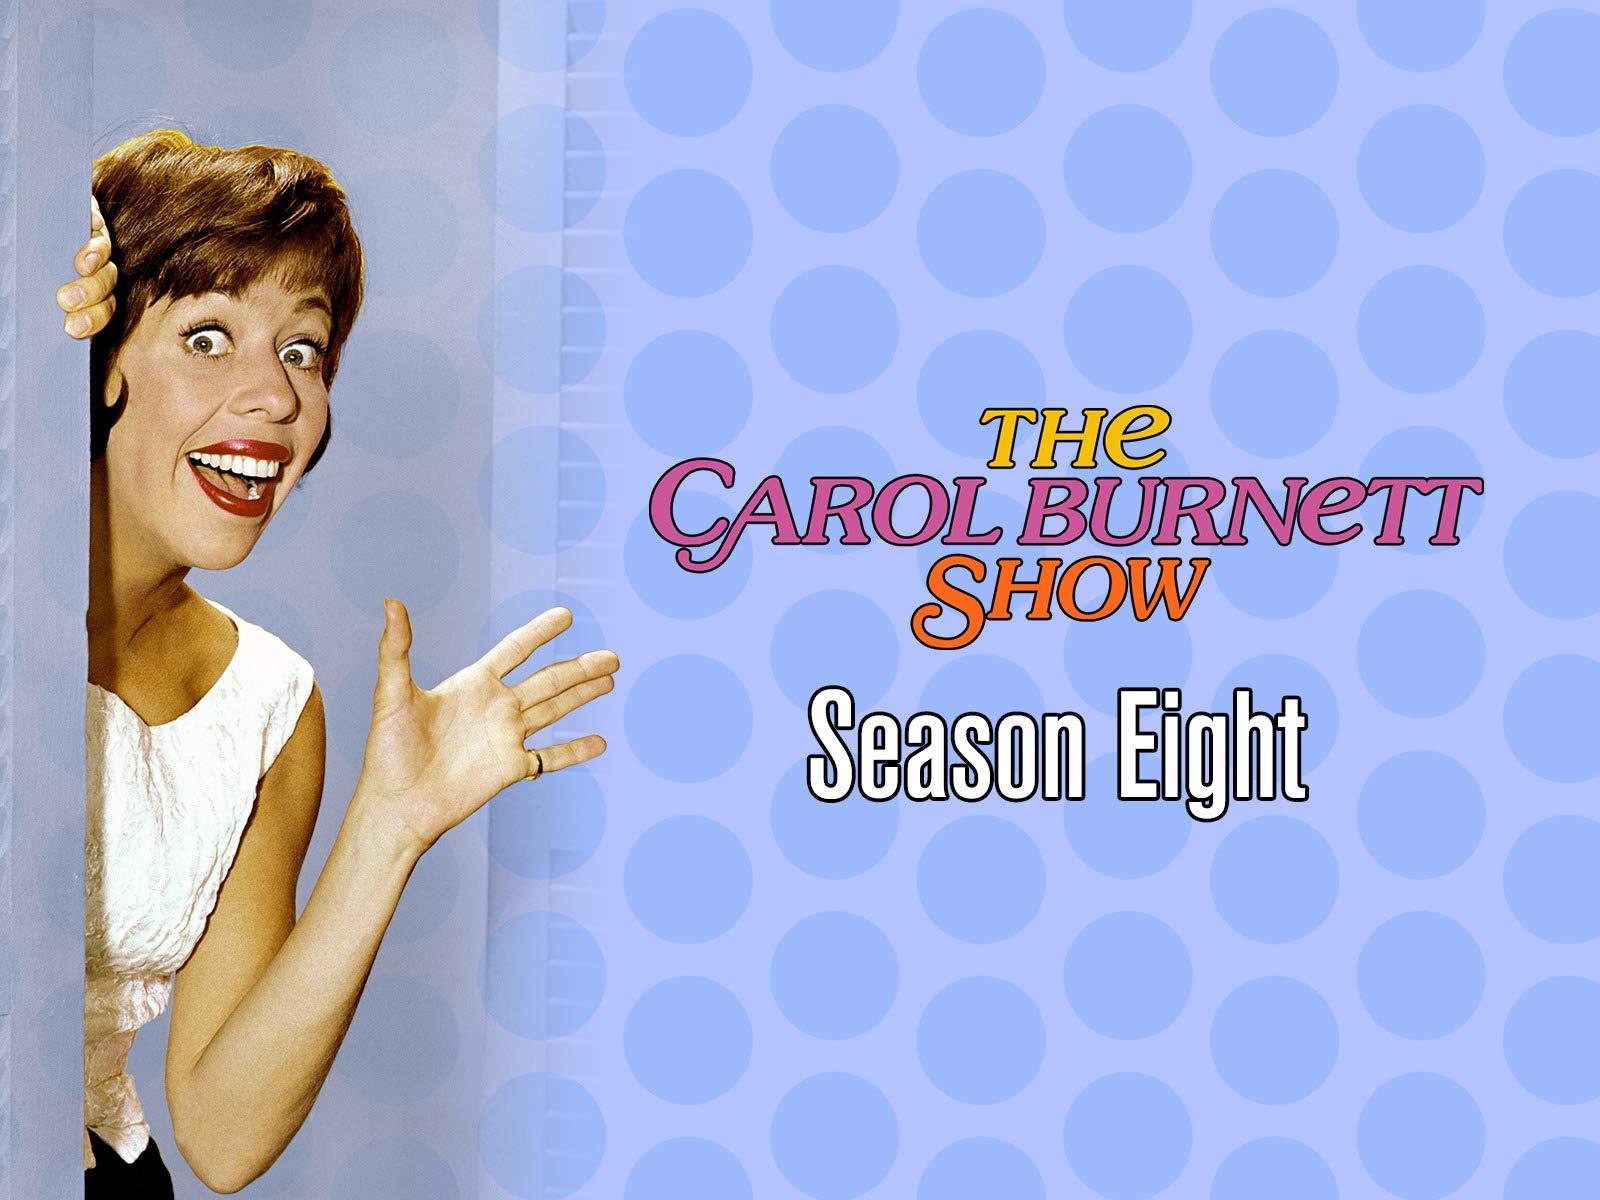 The Carol Burnett Show - Season 8